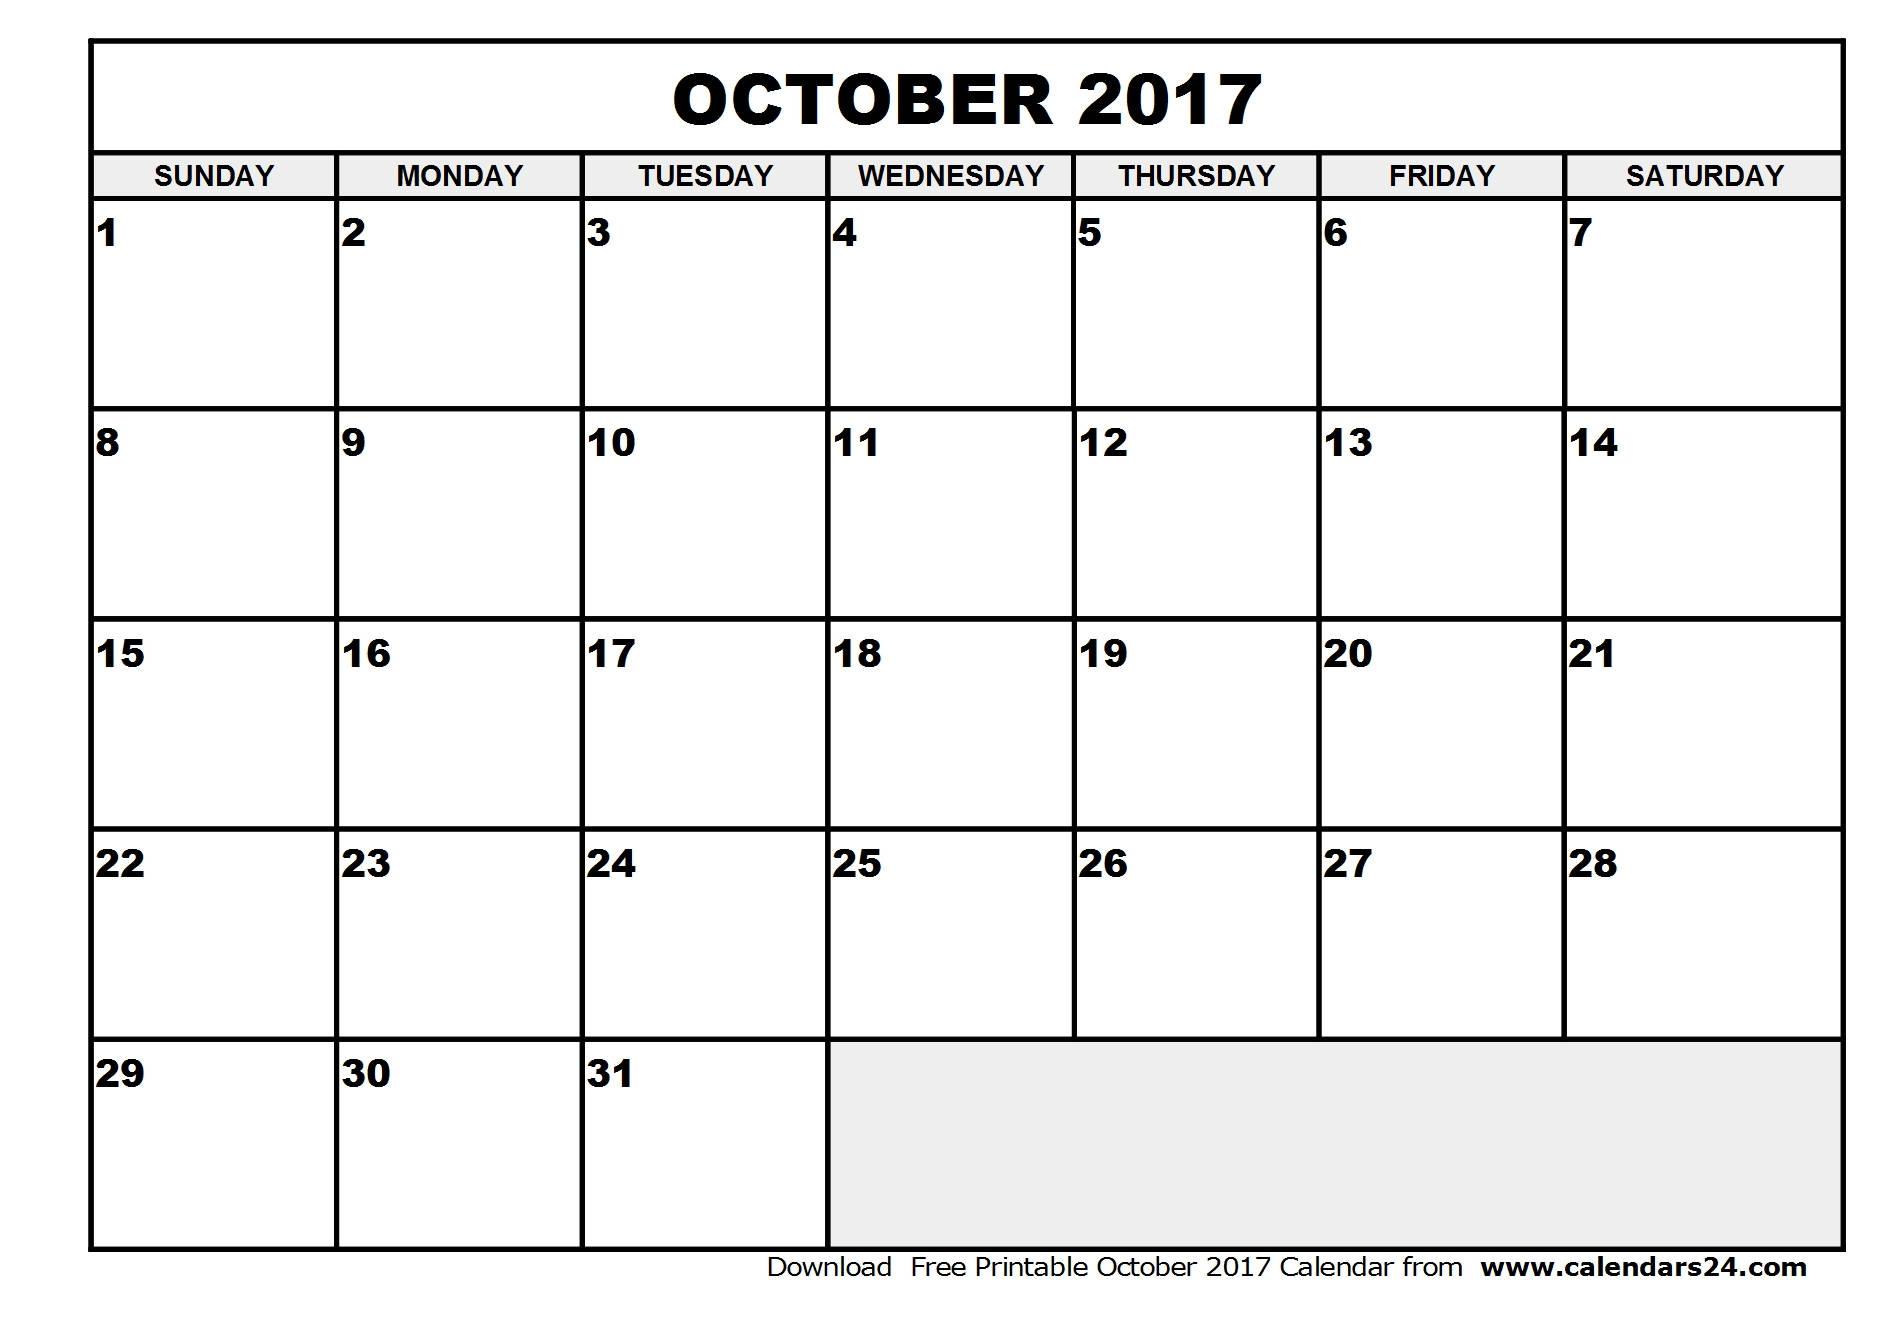 October 2017 Calendar & November 2017 Calendar